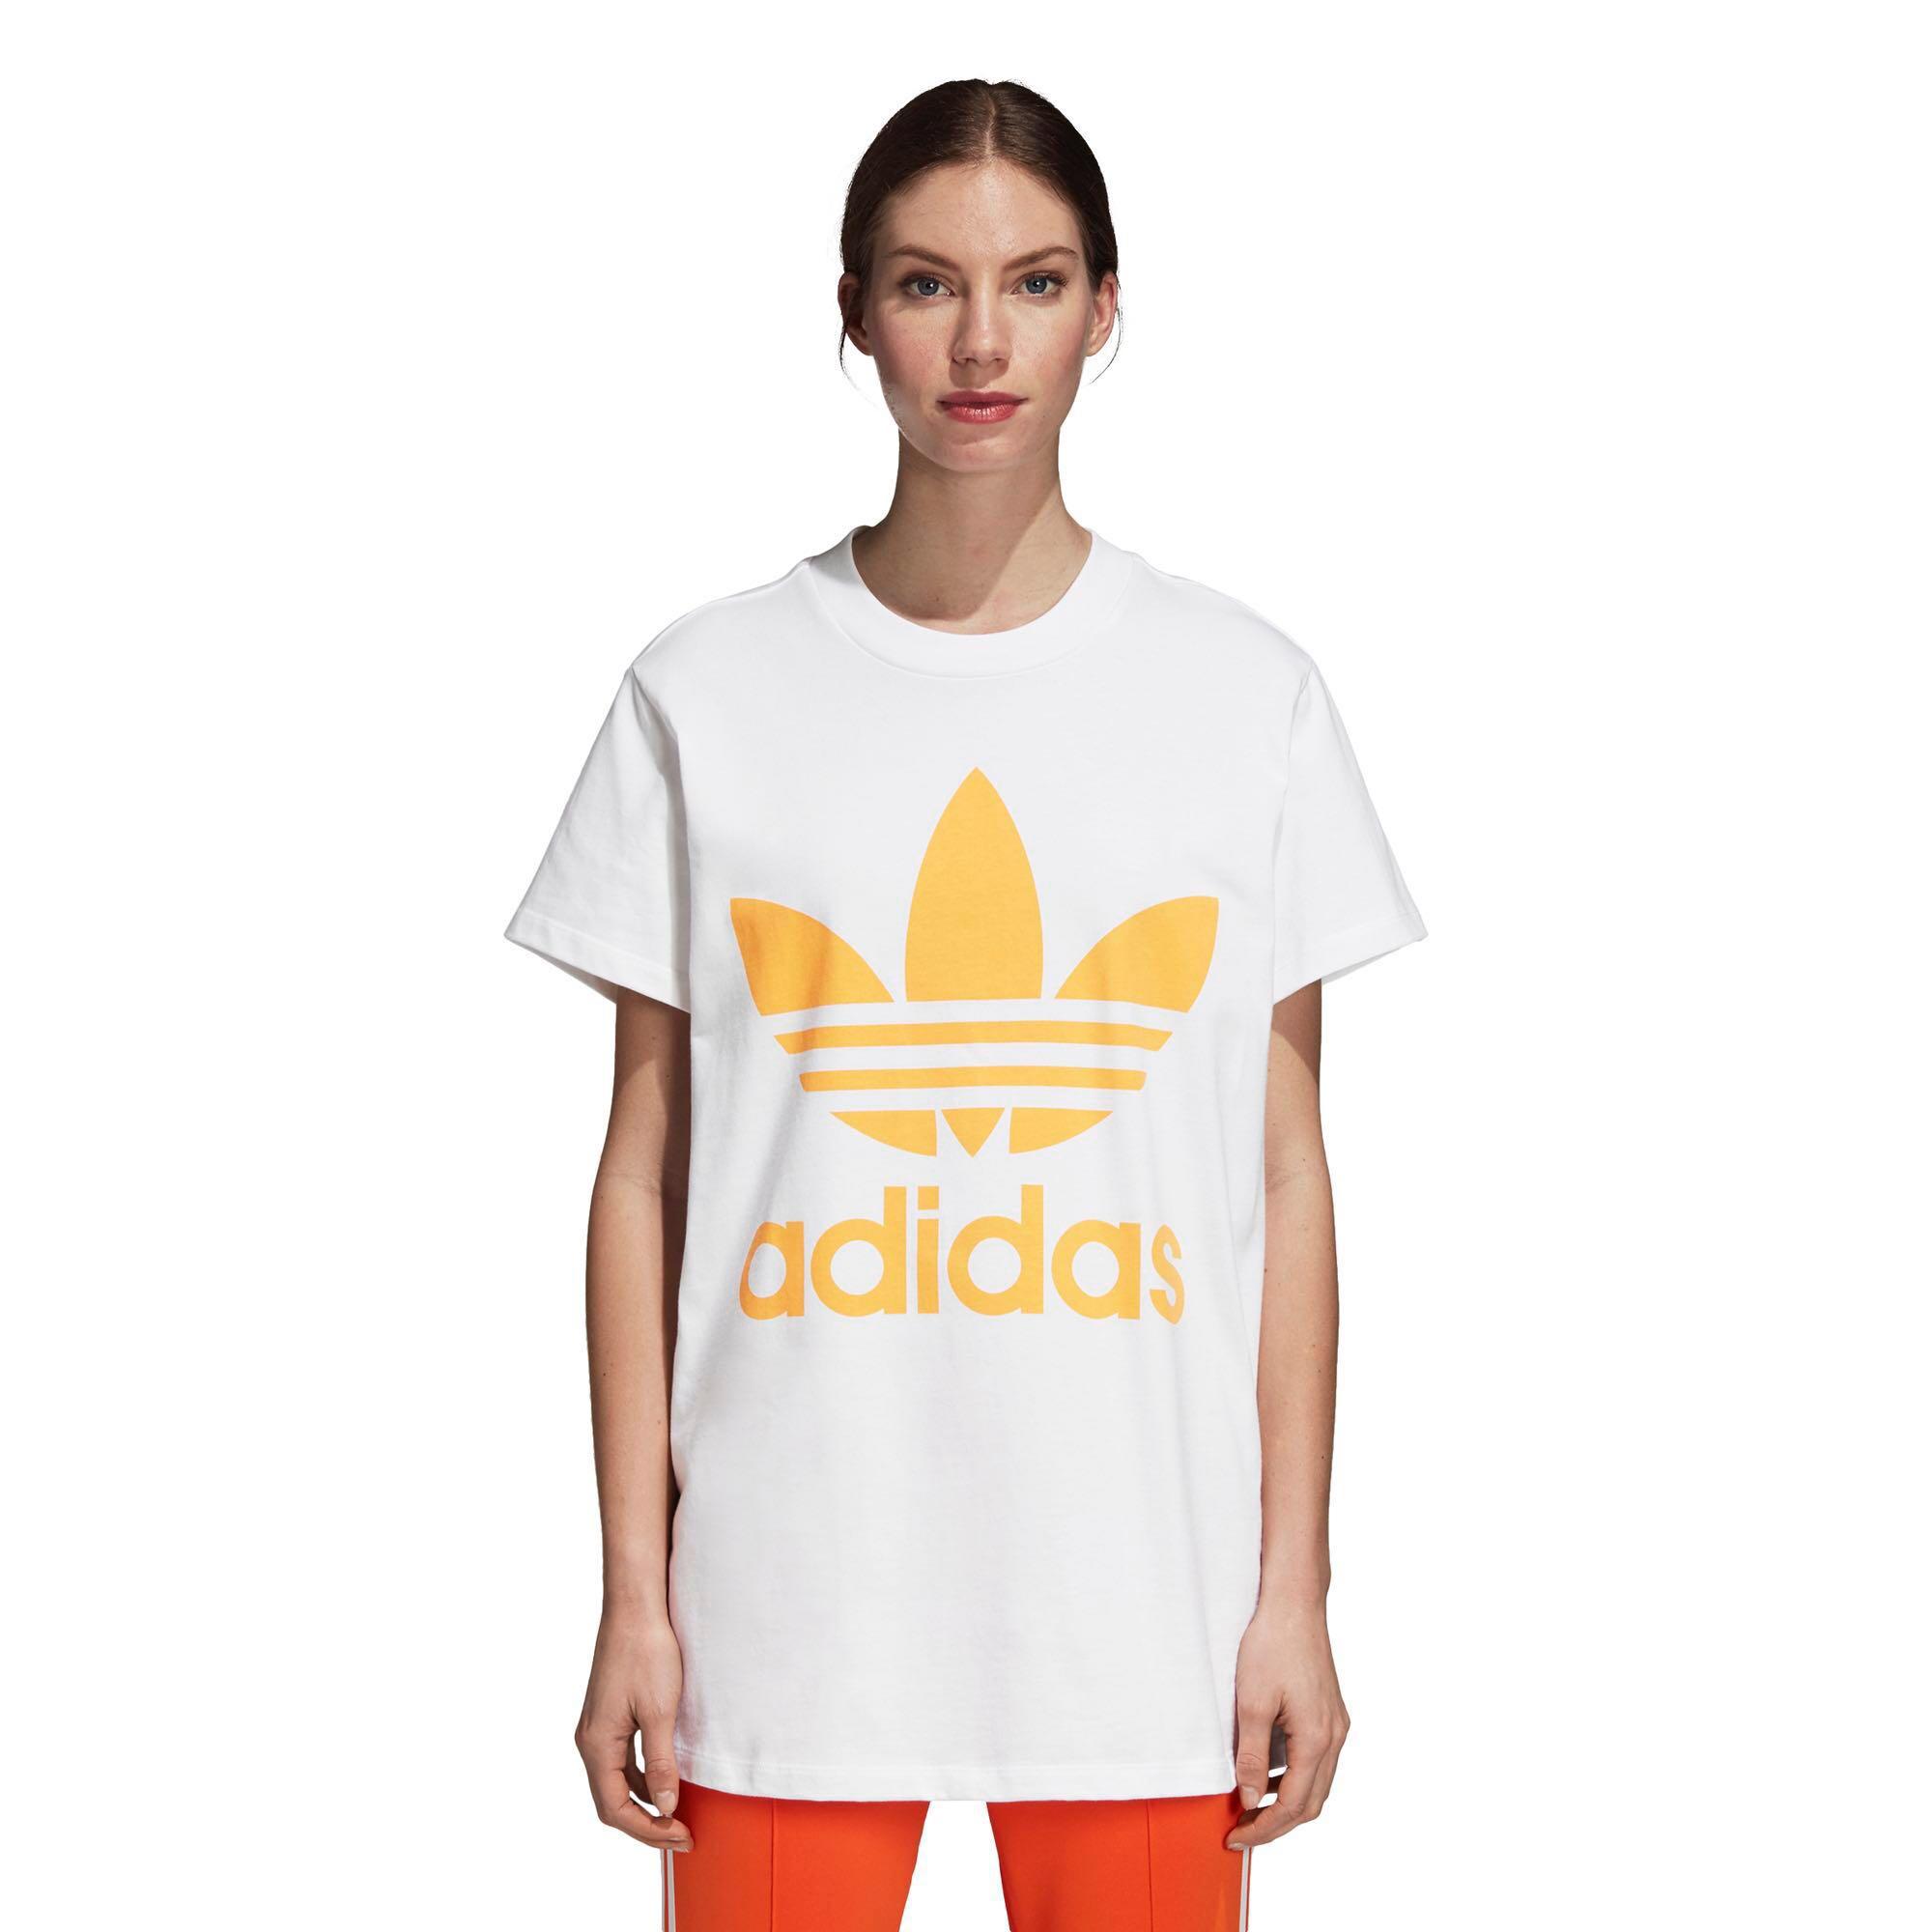 166fadcb94585 Adidas Trefoil T Shirt Womens - DREAMWORKS